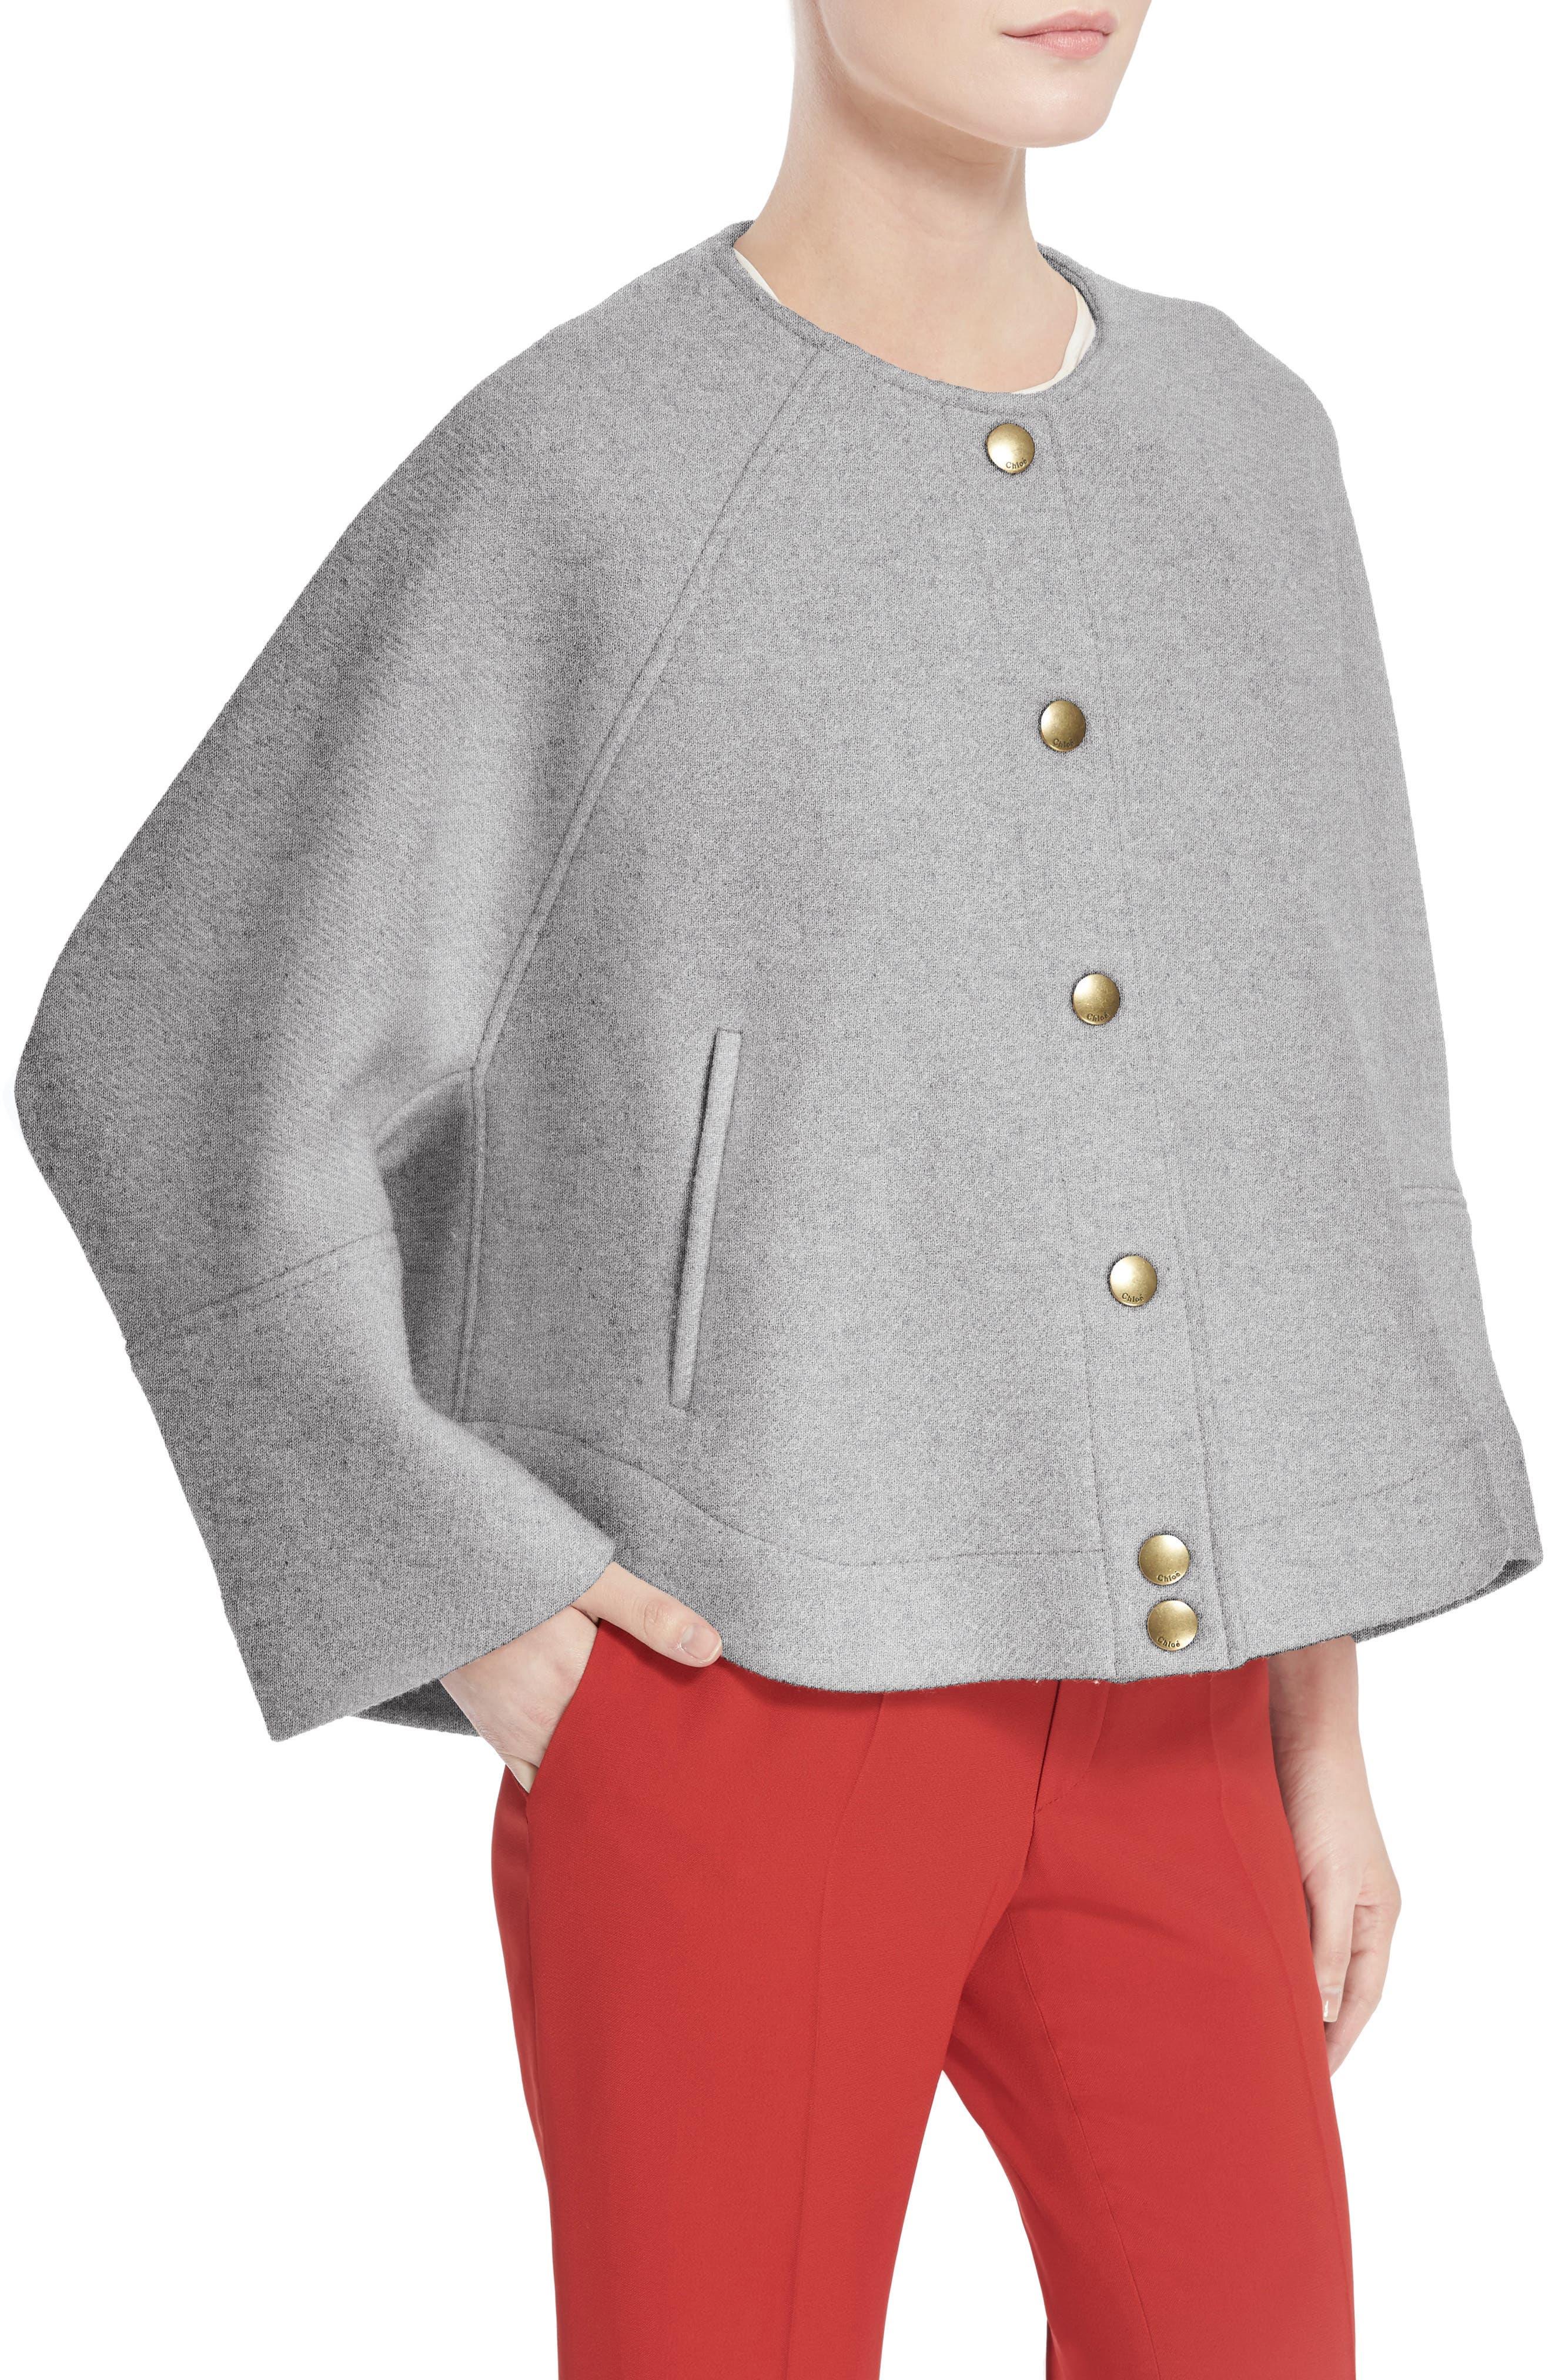 Wool Blend Baseball Jacket,                             Alternate thumbnail 4, color,